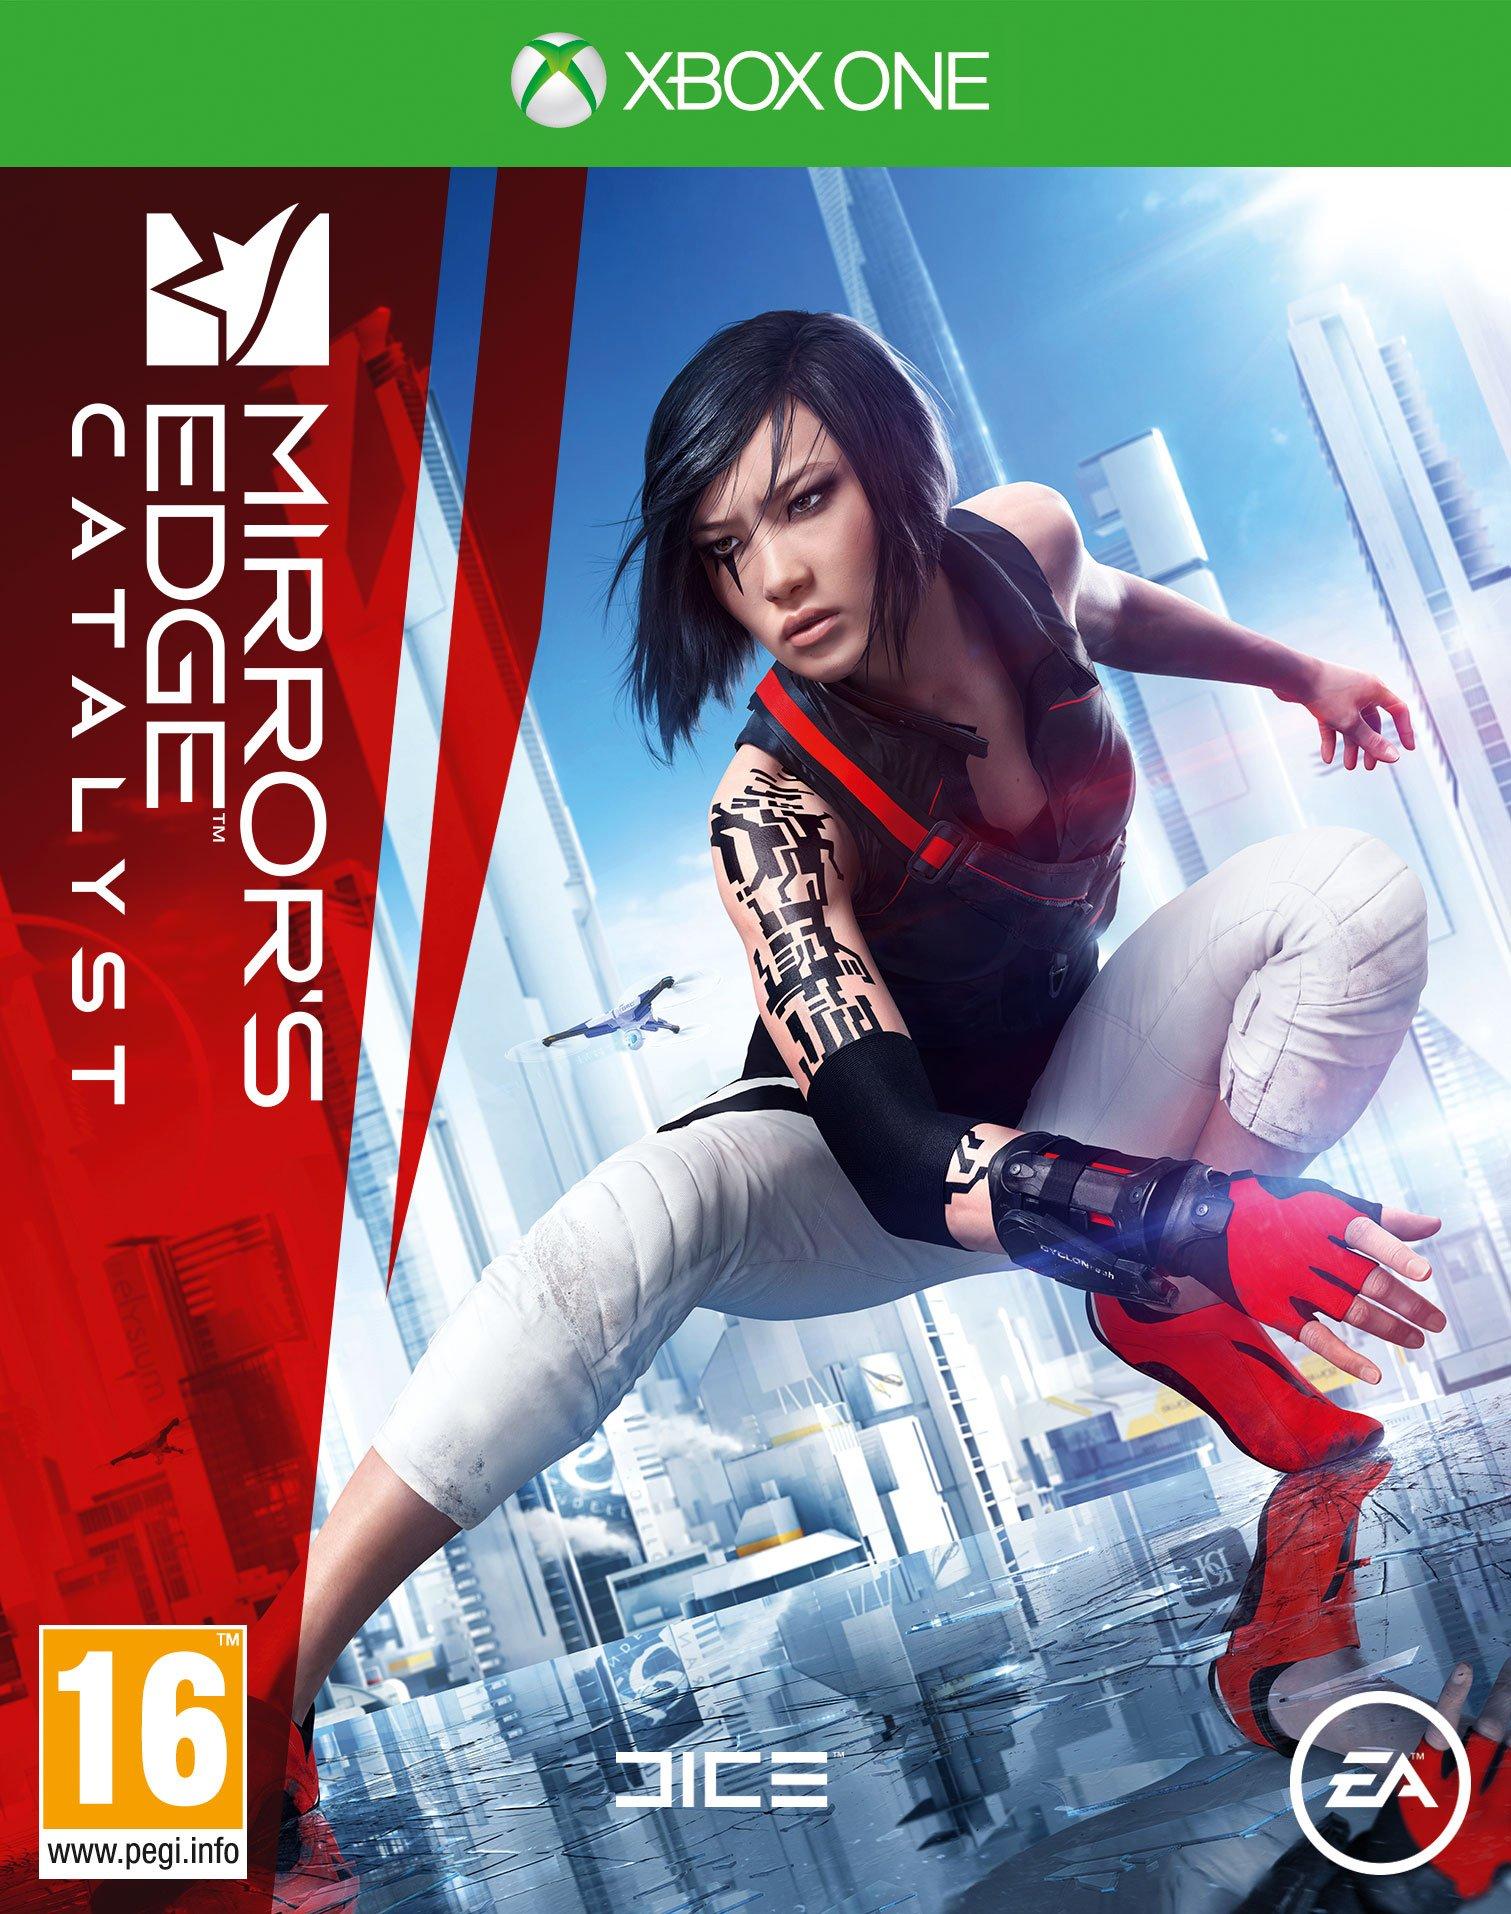 EA Mirrors Edge - Catalyst - Xbox - One Game.